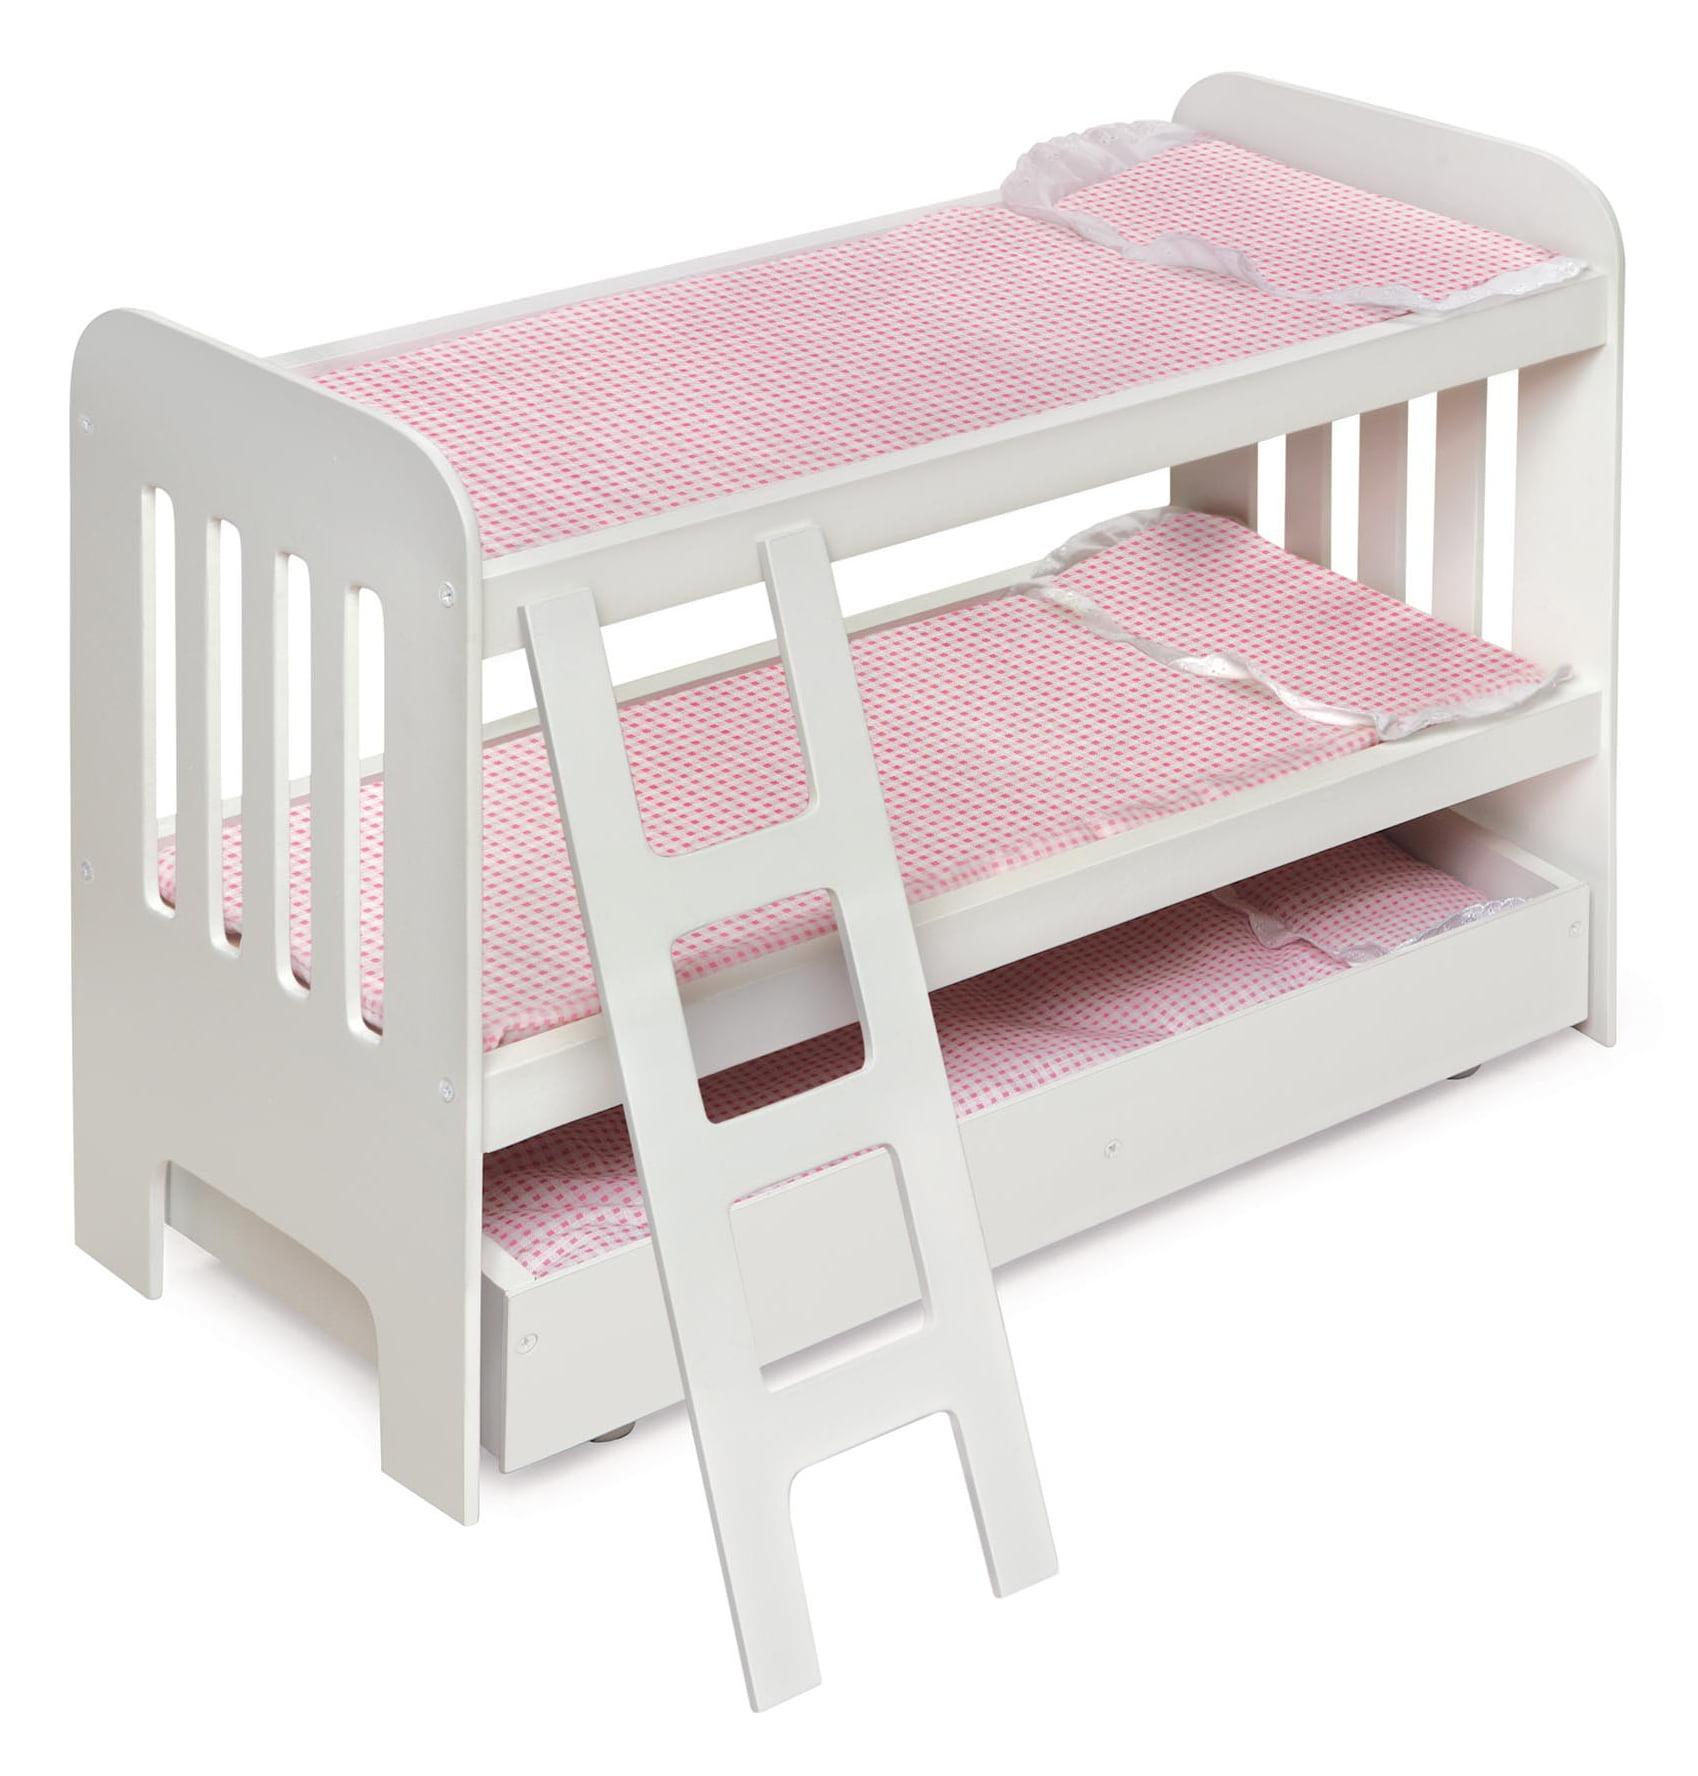 Badger Basket Trundle Doll Bunk Bed With Ladder White Pink Fits